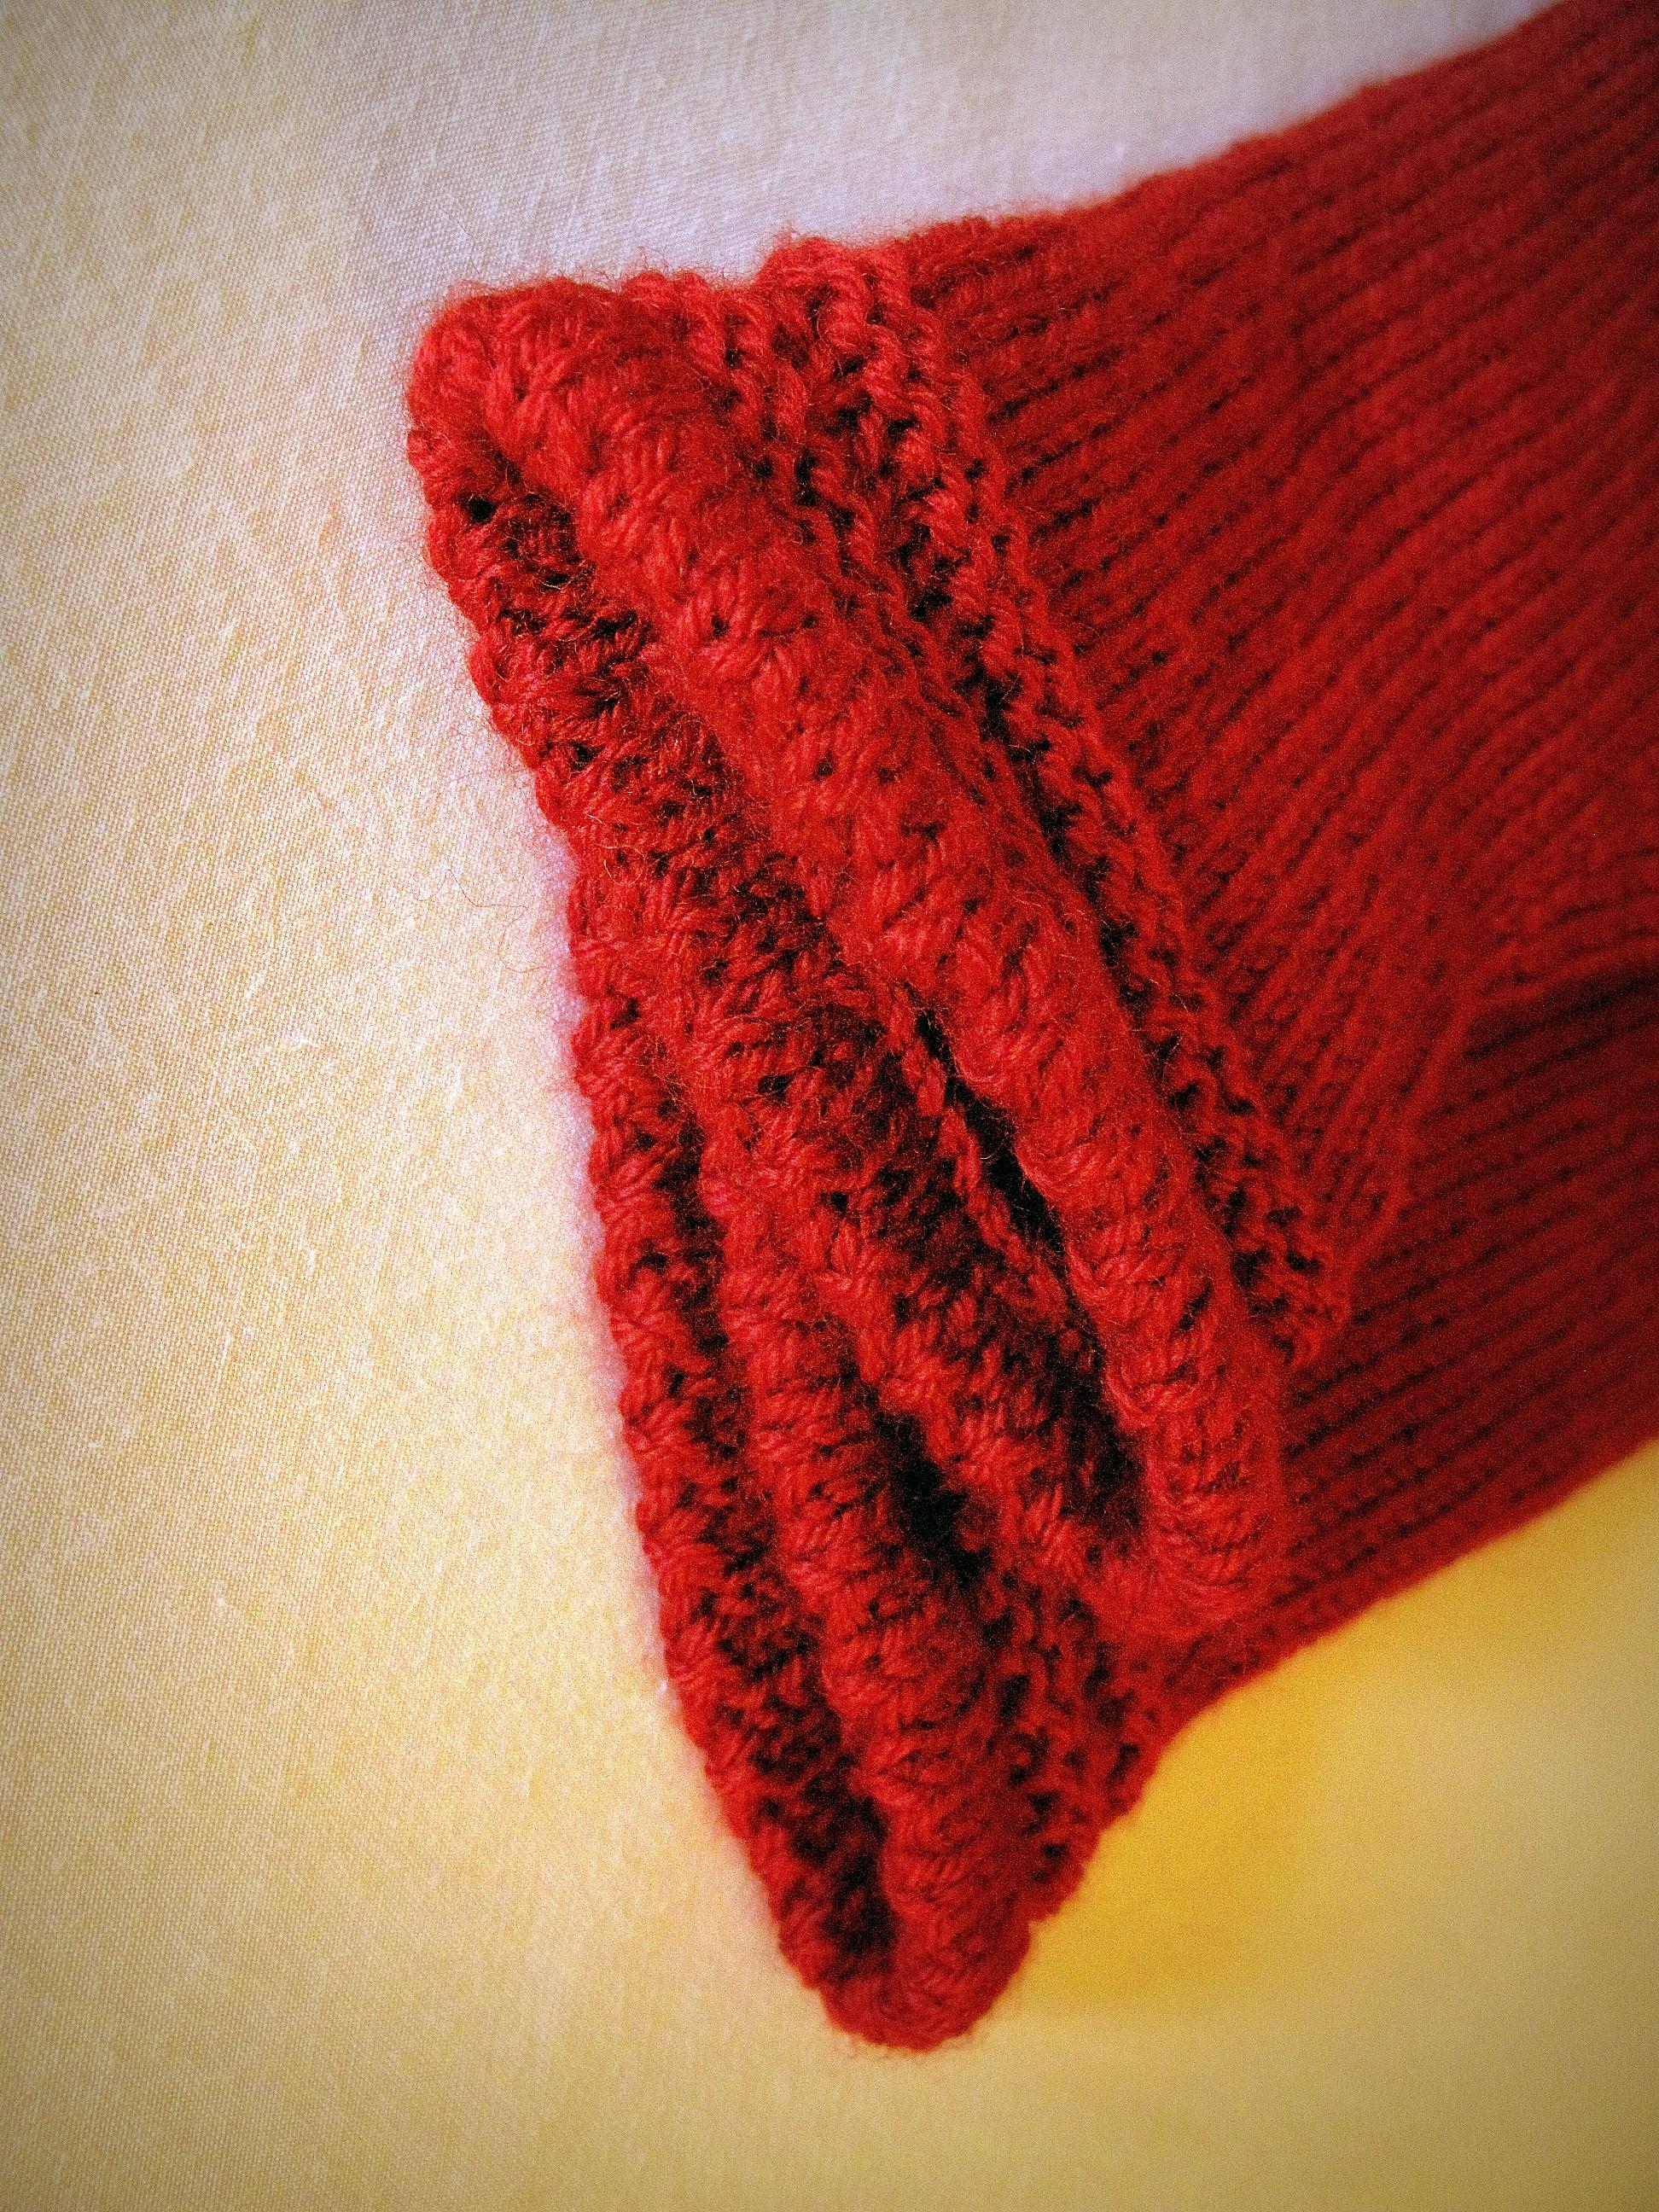 b7a0da21 petal rød høst klær klut ull hekle strikking tekstil Kunst stil myk  strikket tilbehør motetilbehør votter